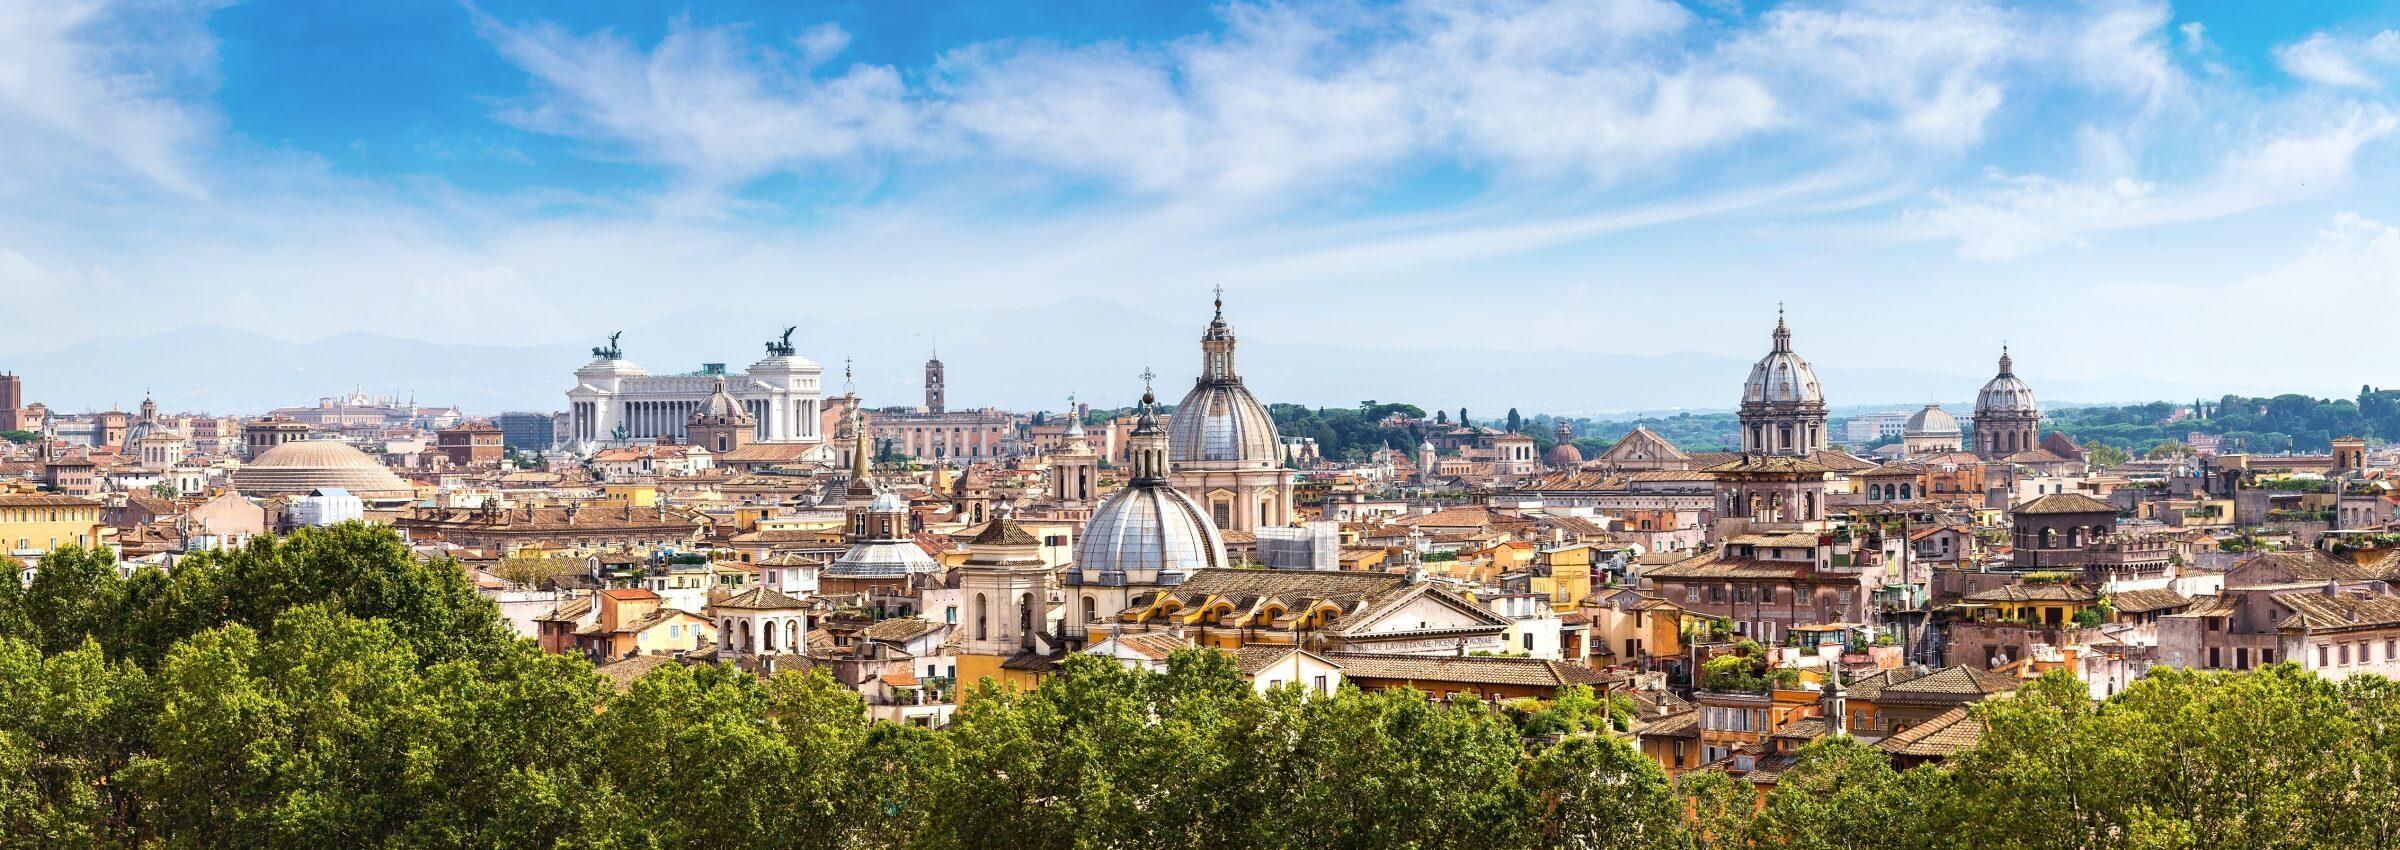 adamare-singlereisen-italien-rom-skyline